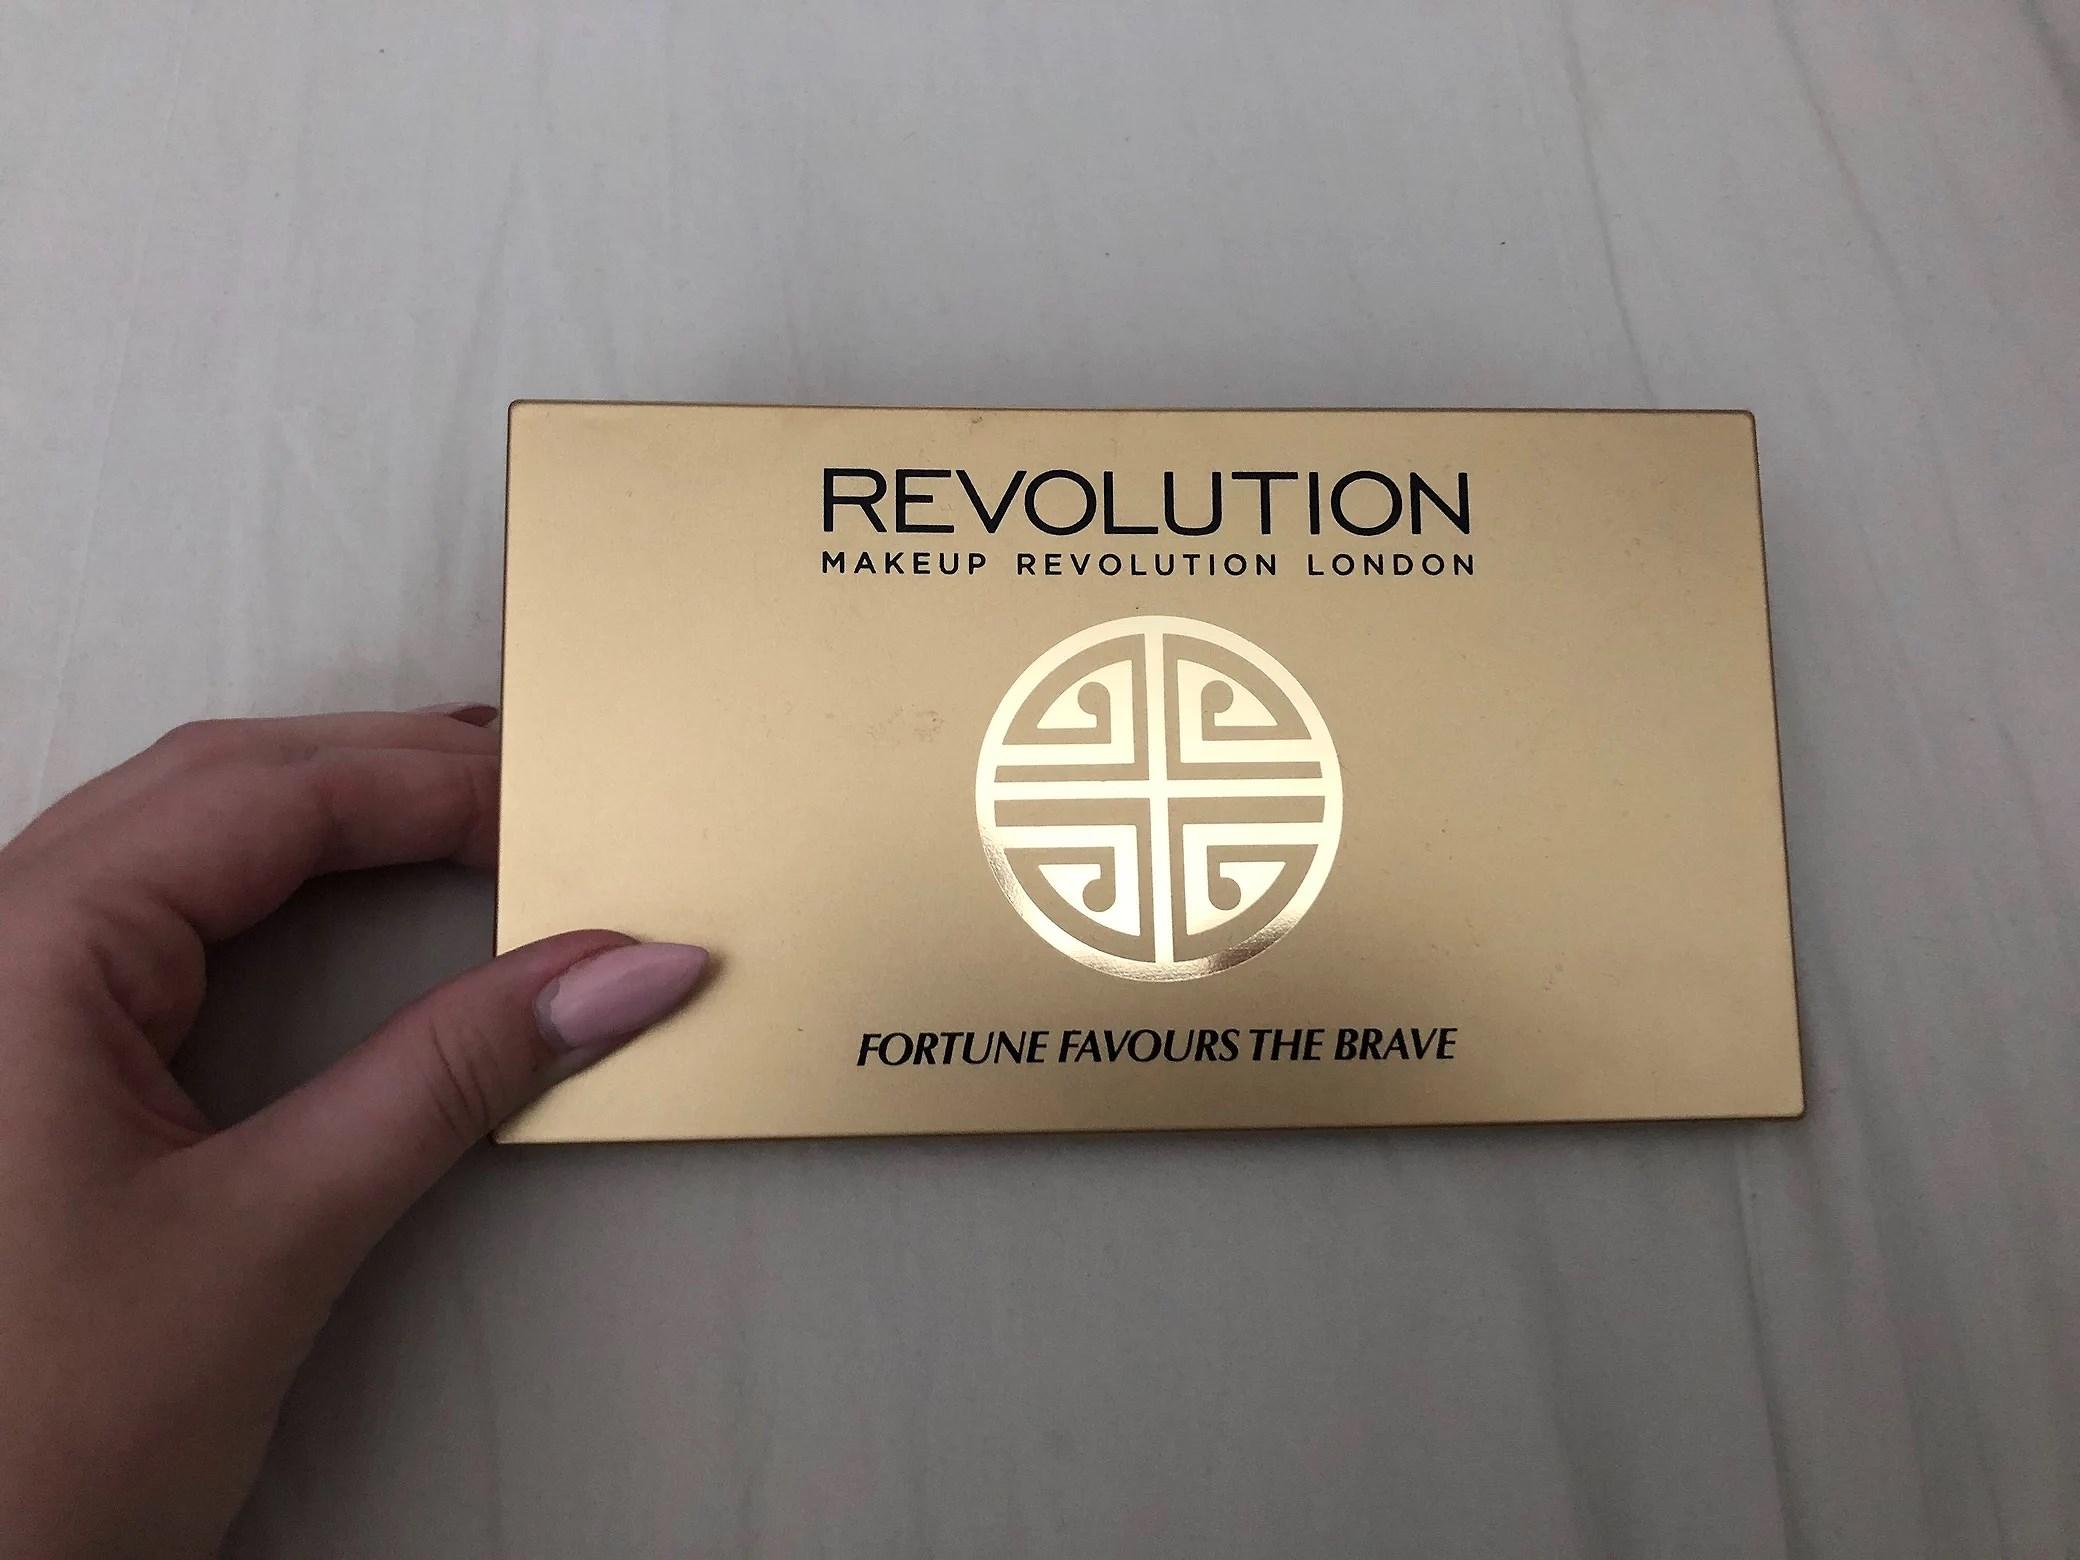 Swatch - Make up Revolution